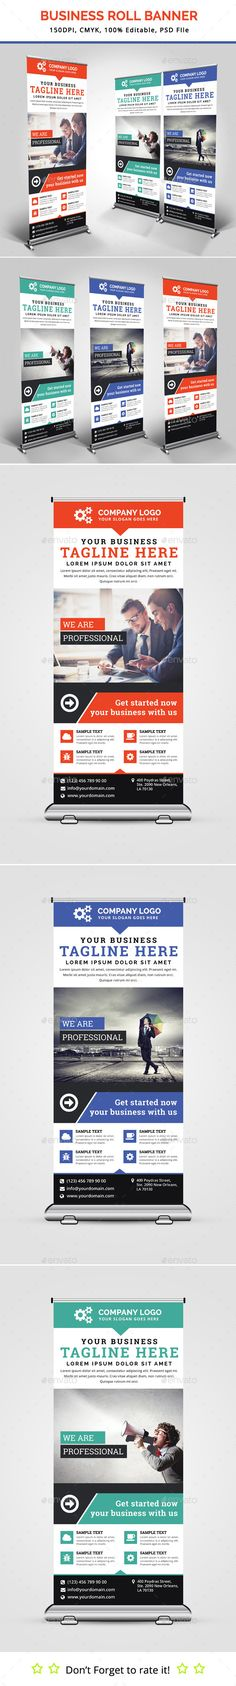 Business Roll Up Banner Template #design Download: http://graphicriver.net/item/business-roll-up-banner-v18/13201955?ref=ksioks